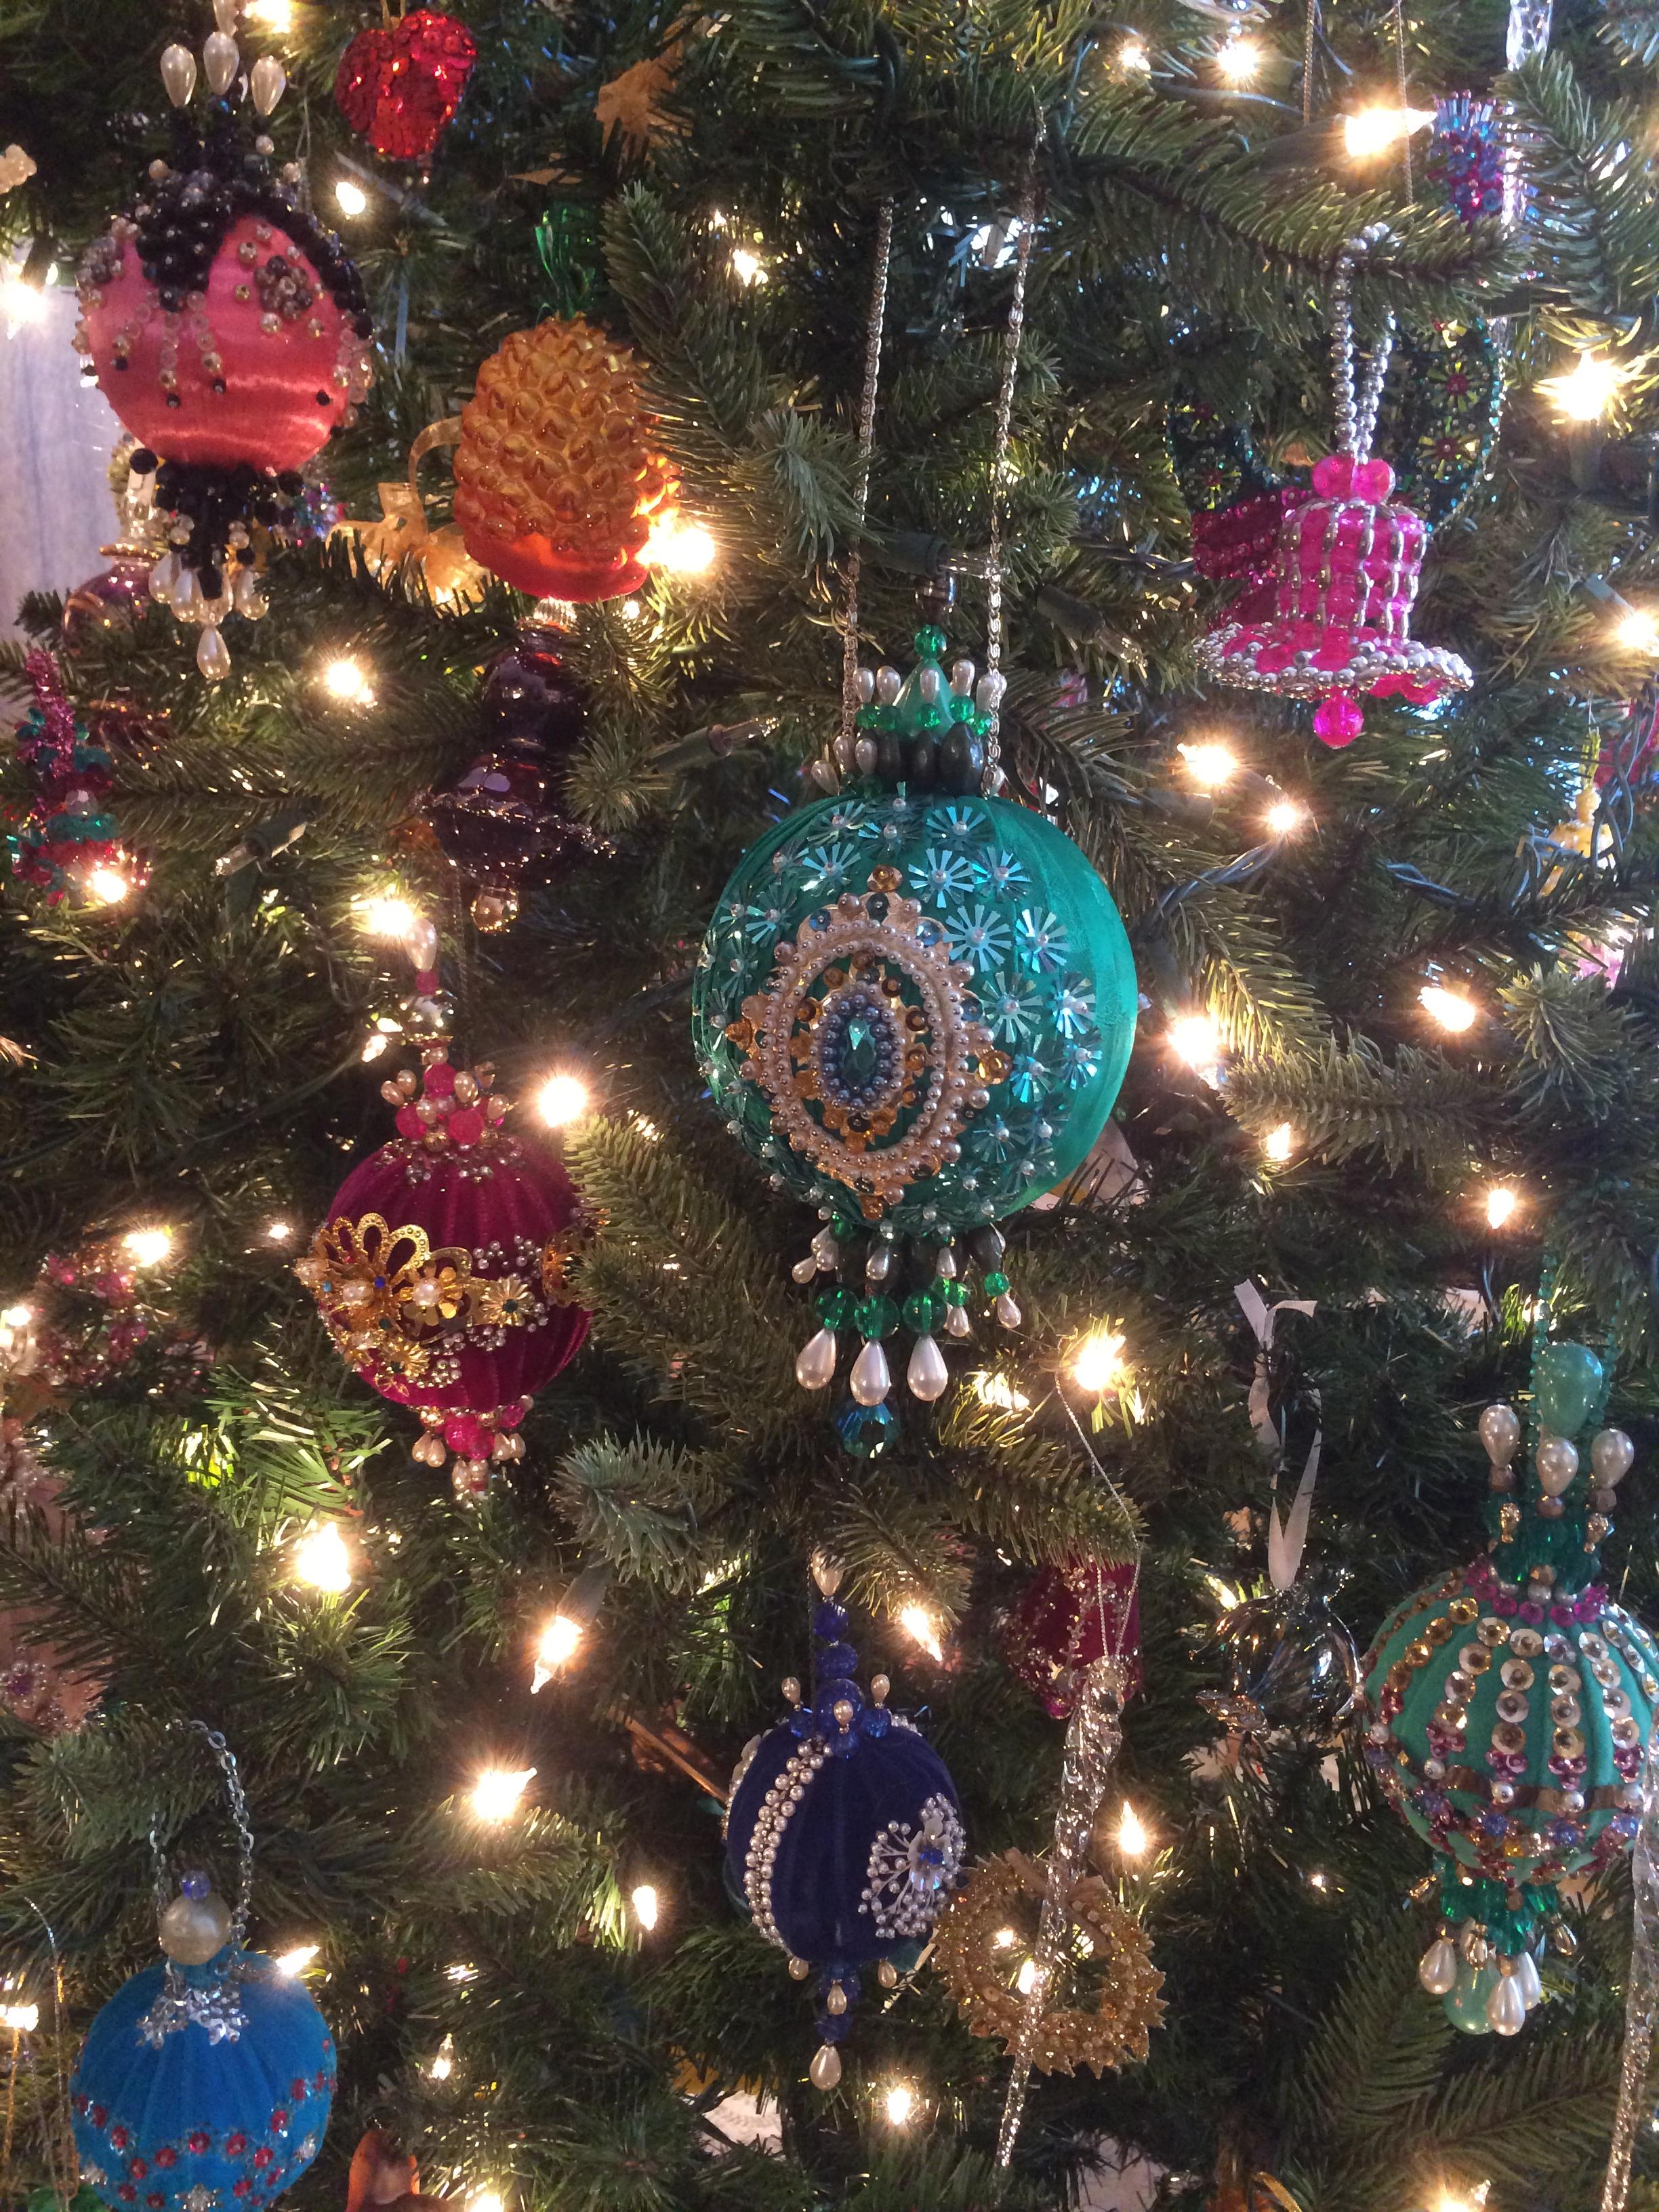 White house christmas ornaments historical society - Christmas 66